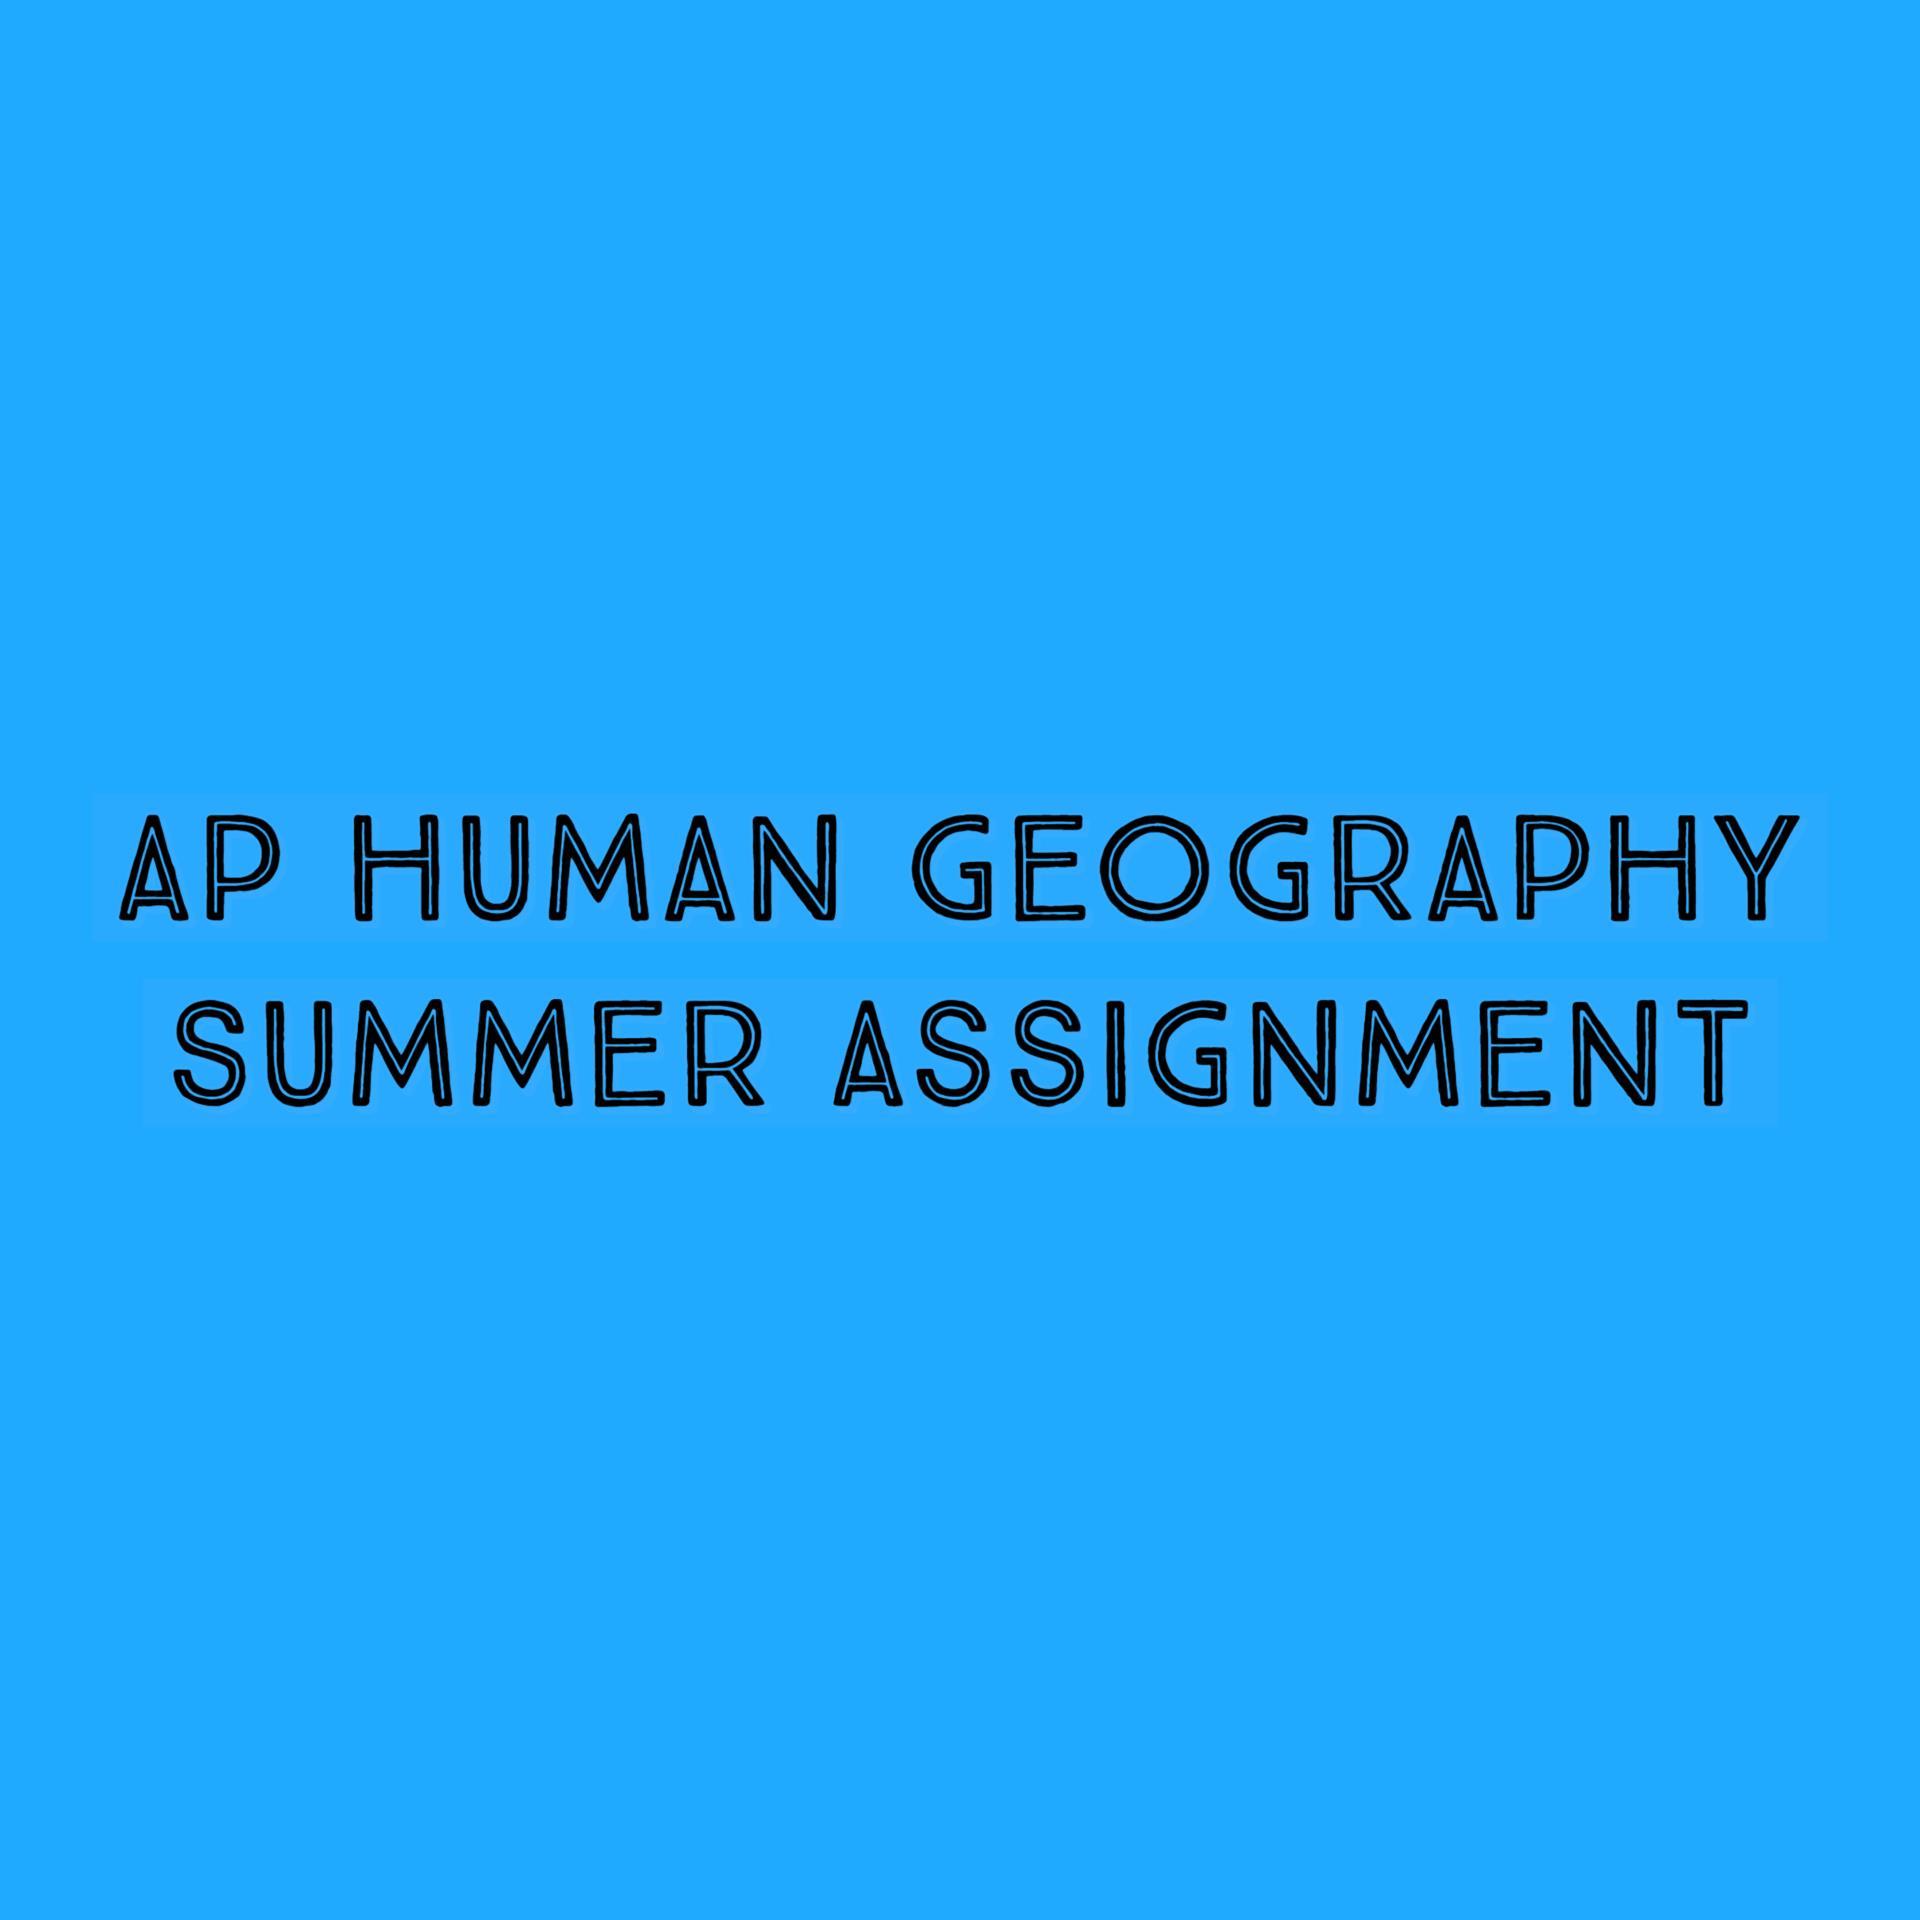 AP HUMAN GEO SUMMER